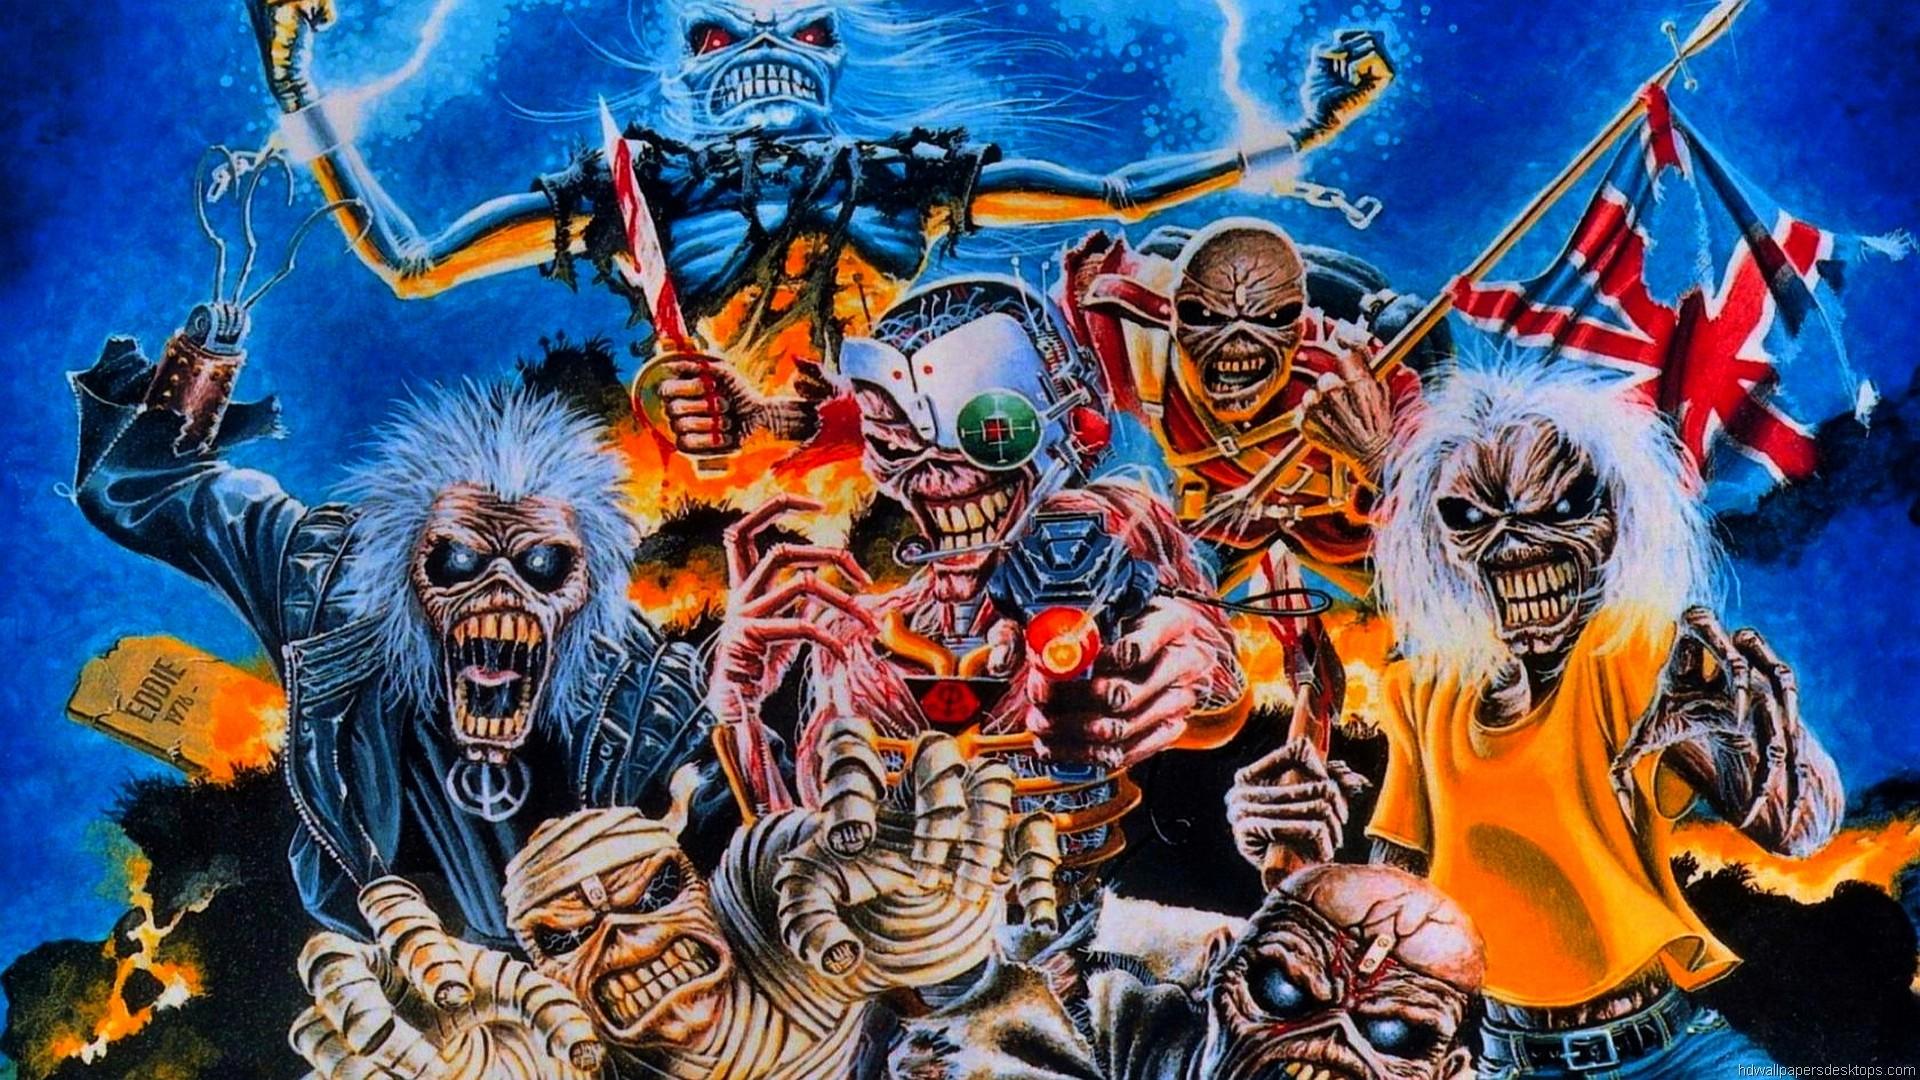 Iron Maiden Wallpaper, Iron Maiden HD Wallpaper, Background, 1920×1080